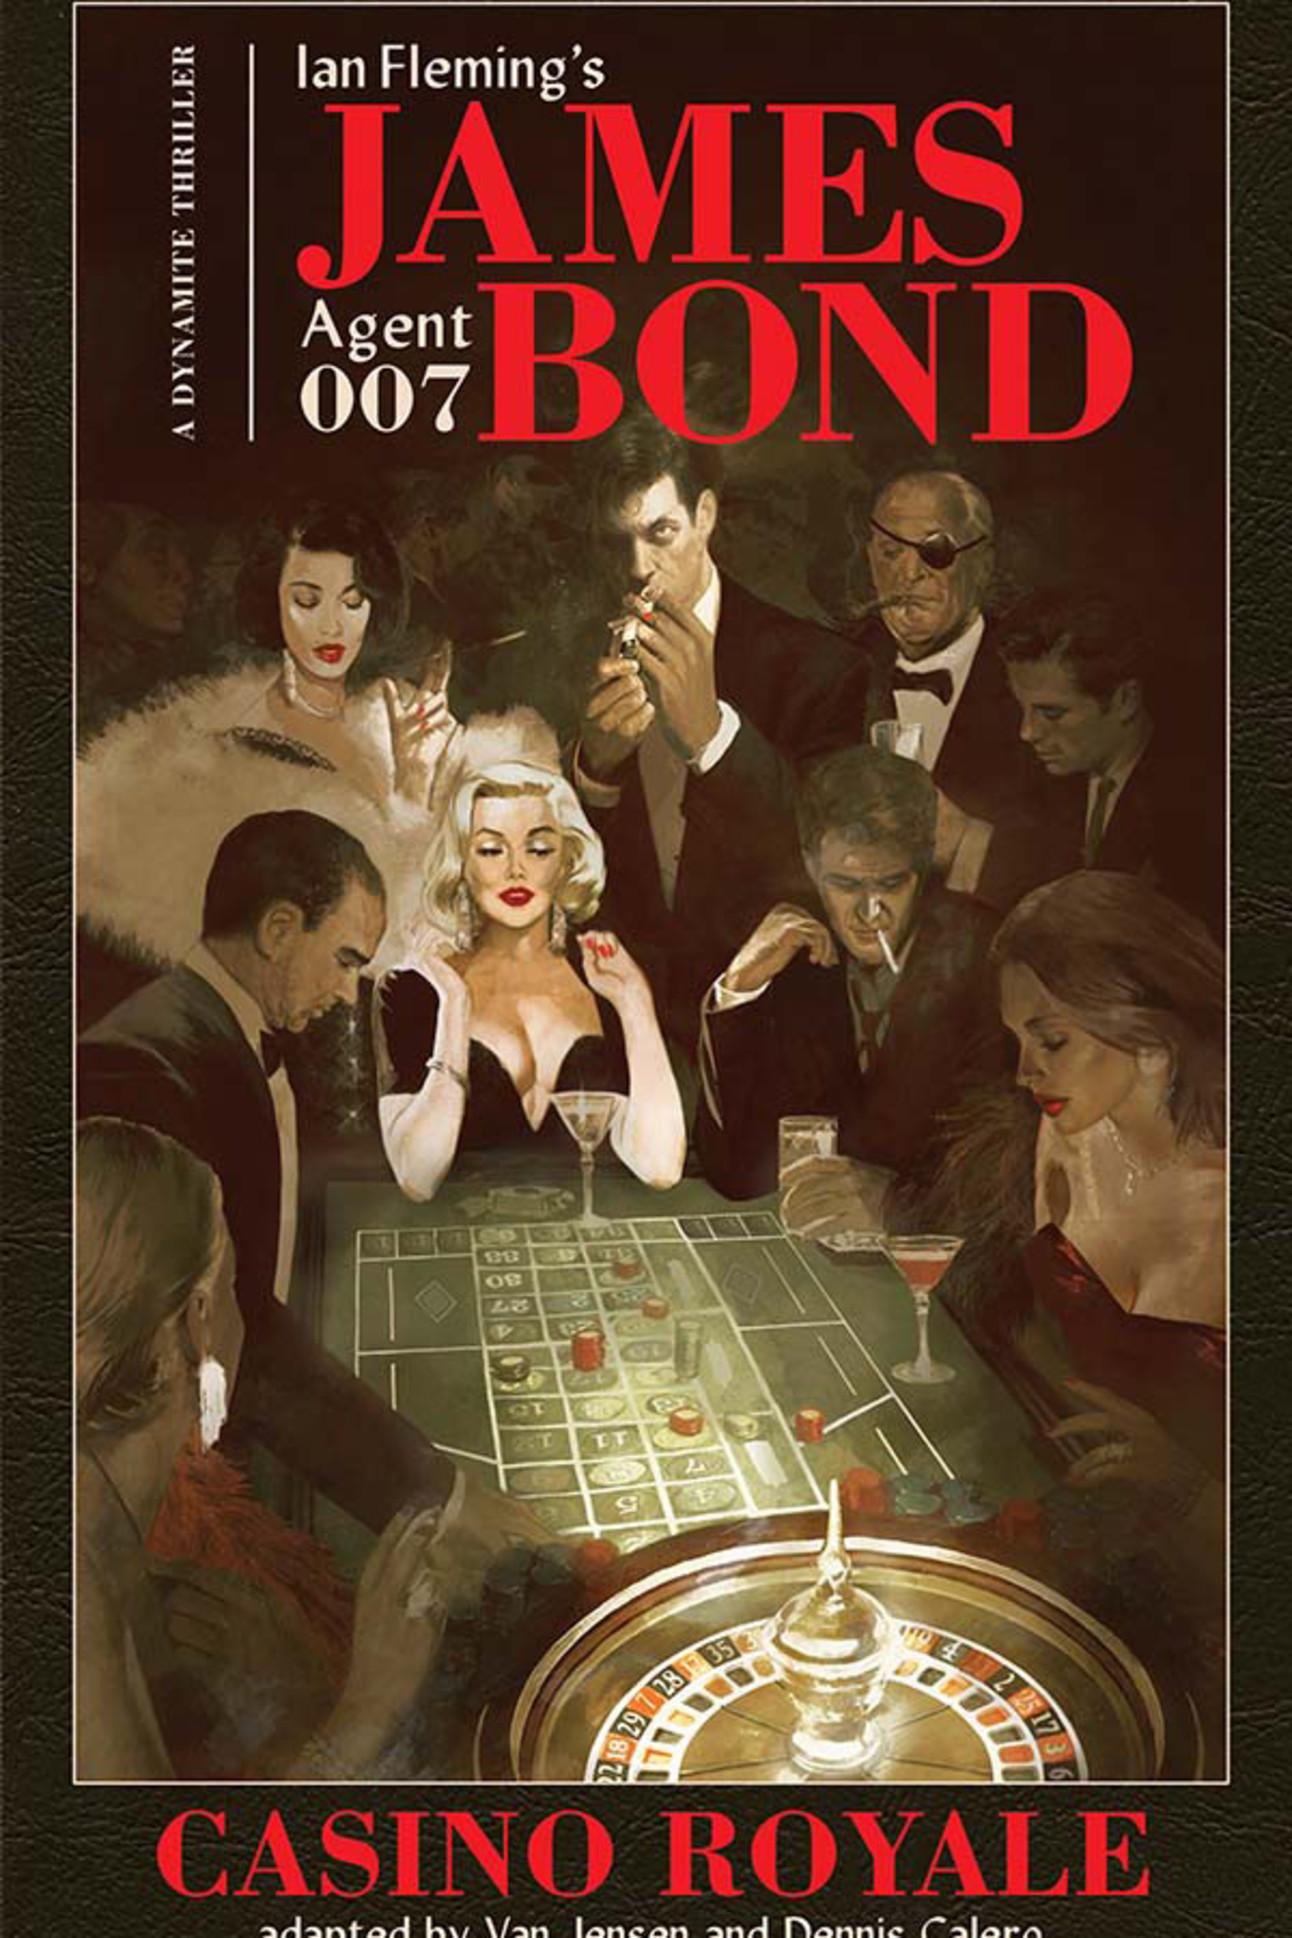 dynamite_james_bond_casino_royale_cover.jpg